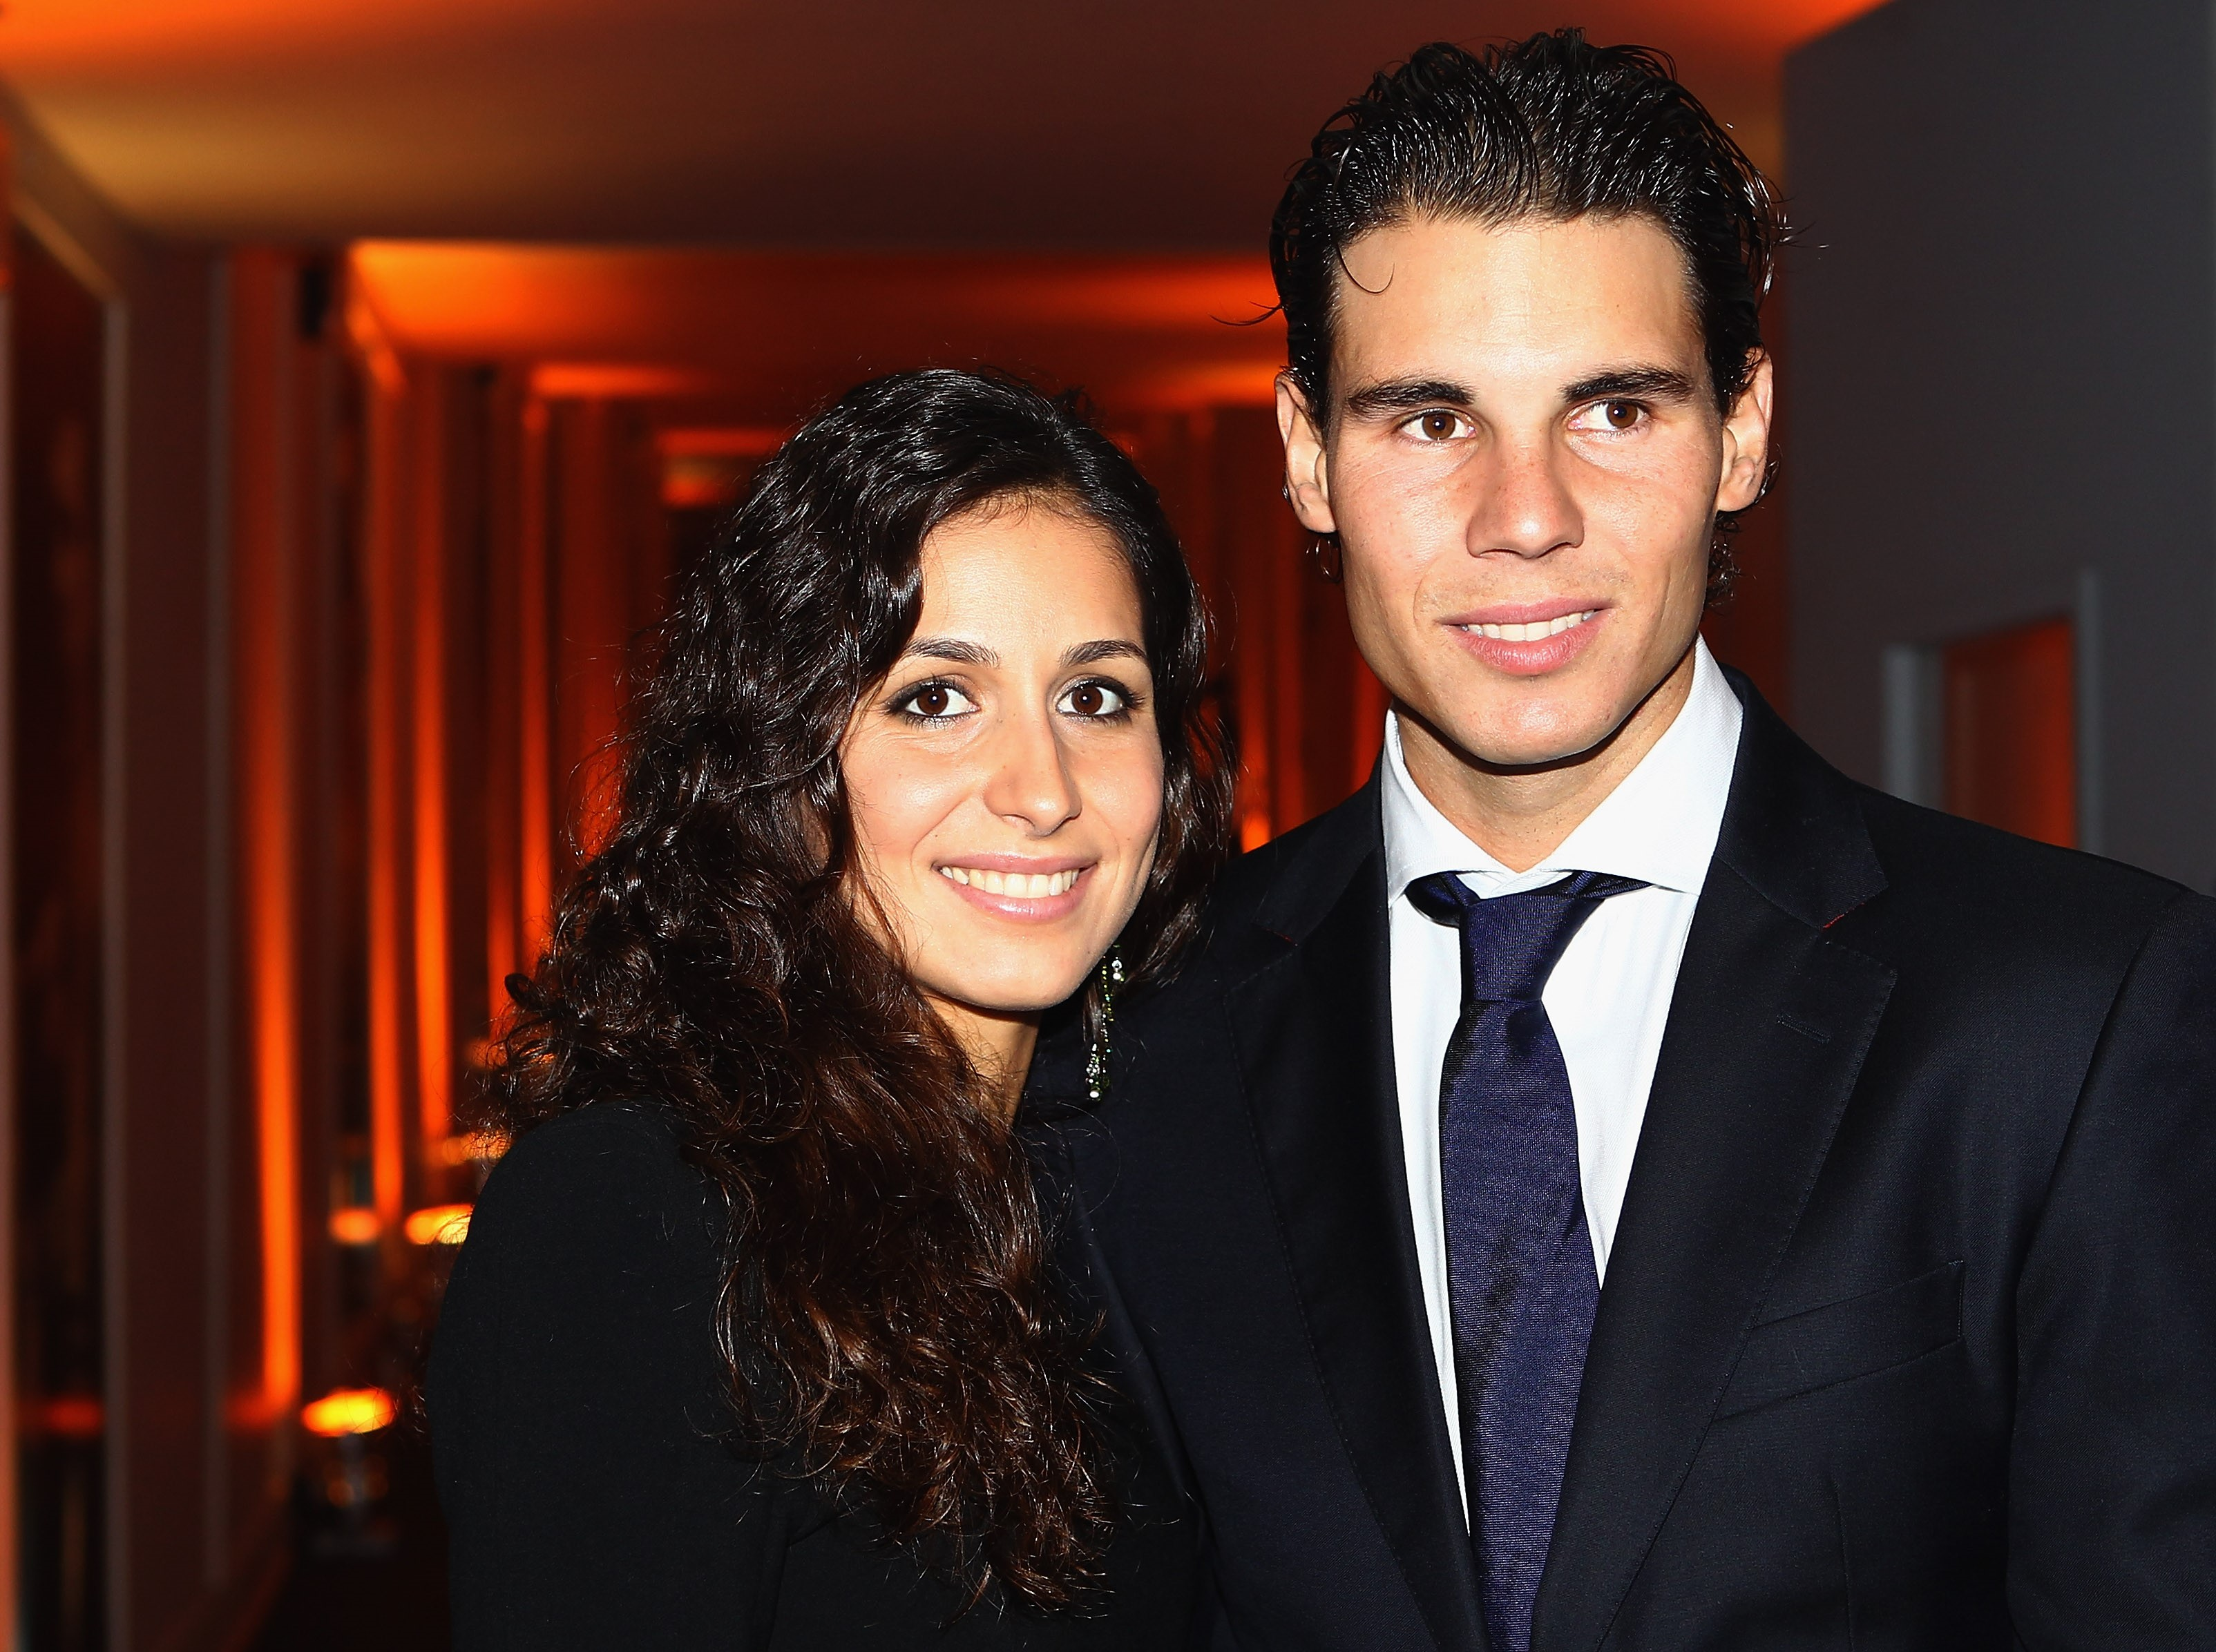 Rafael Nadal and Maria Perello